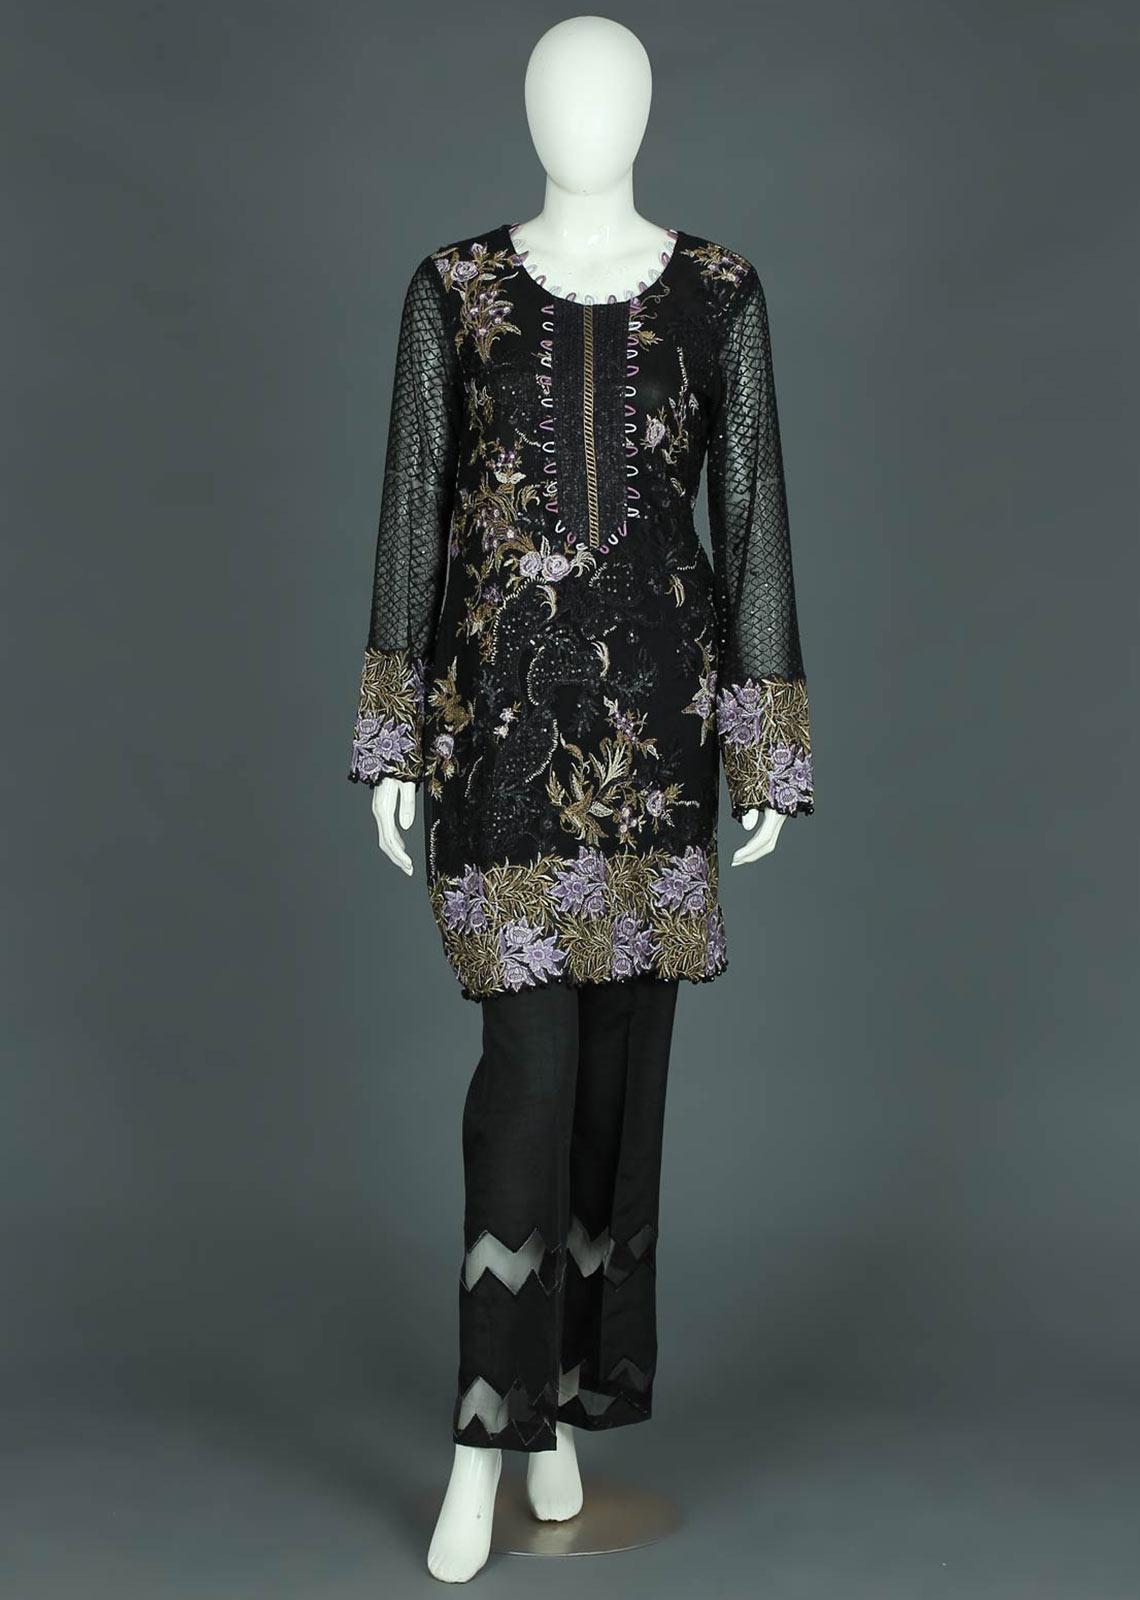 Chiffon or Net suits